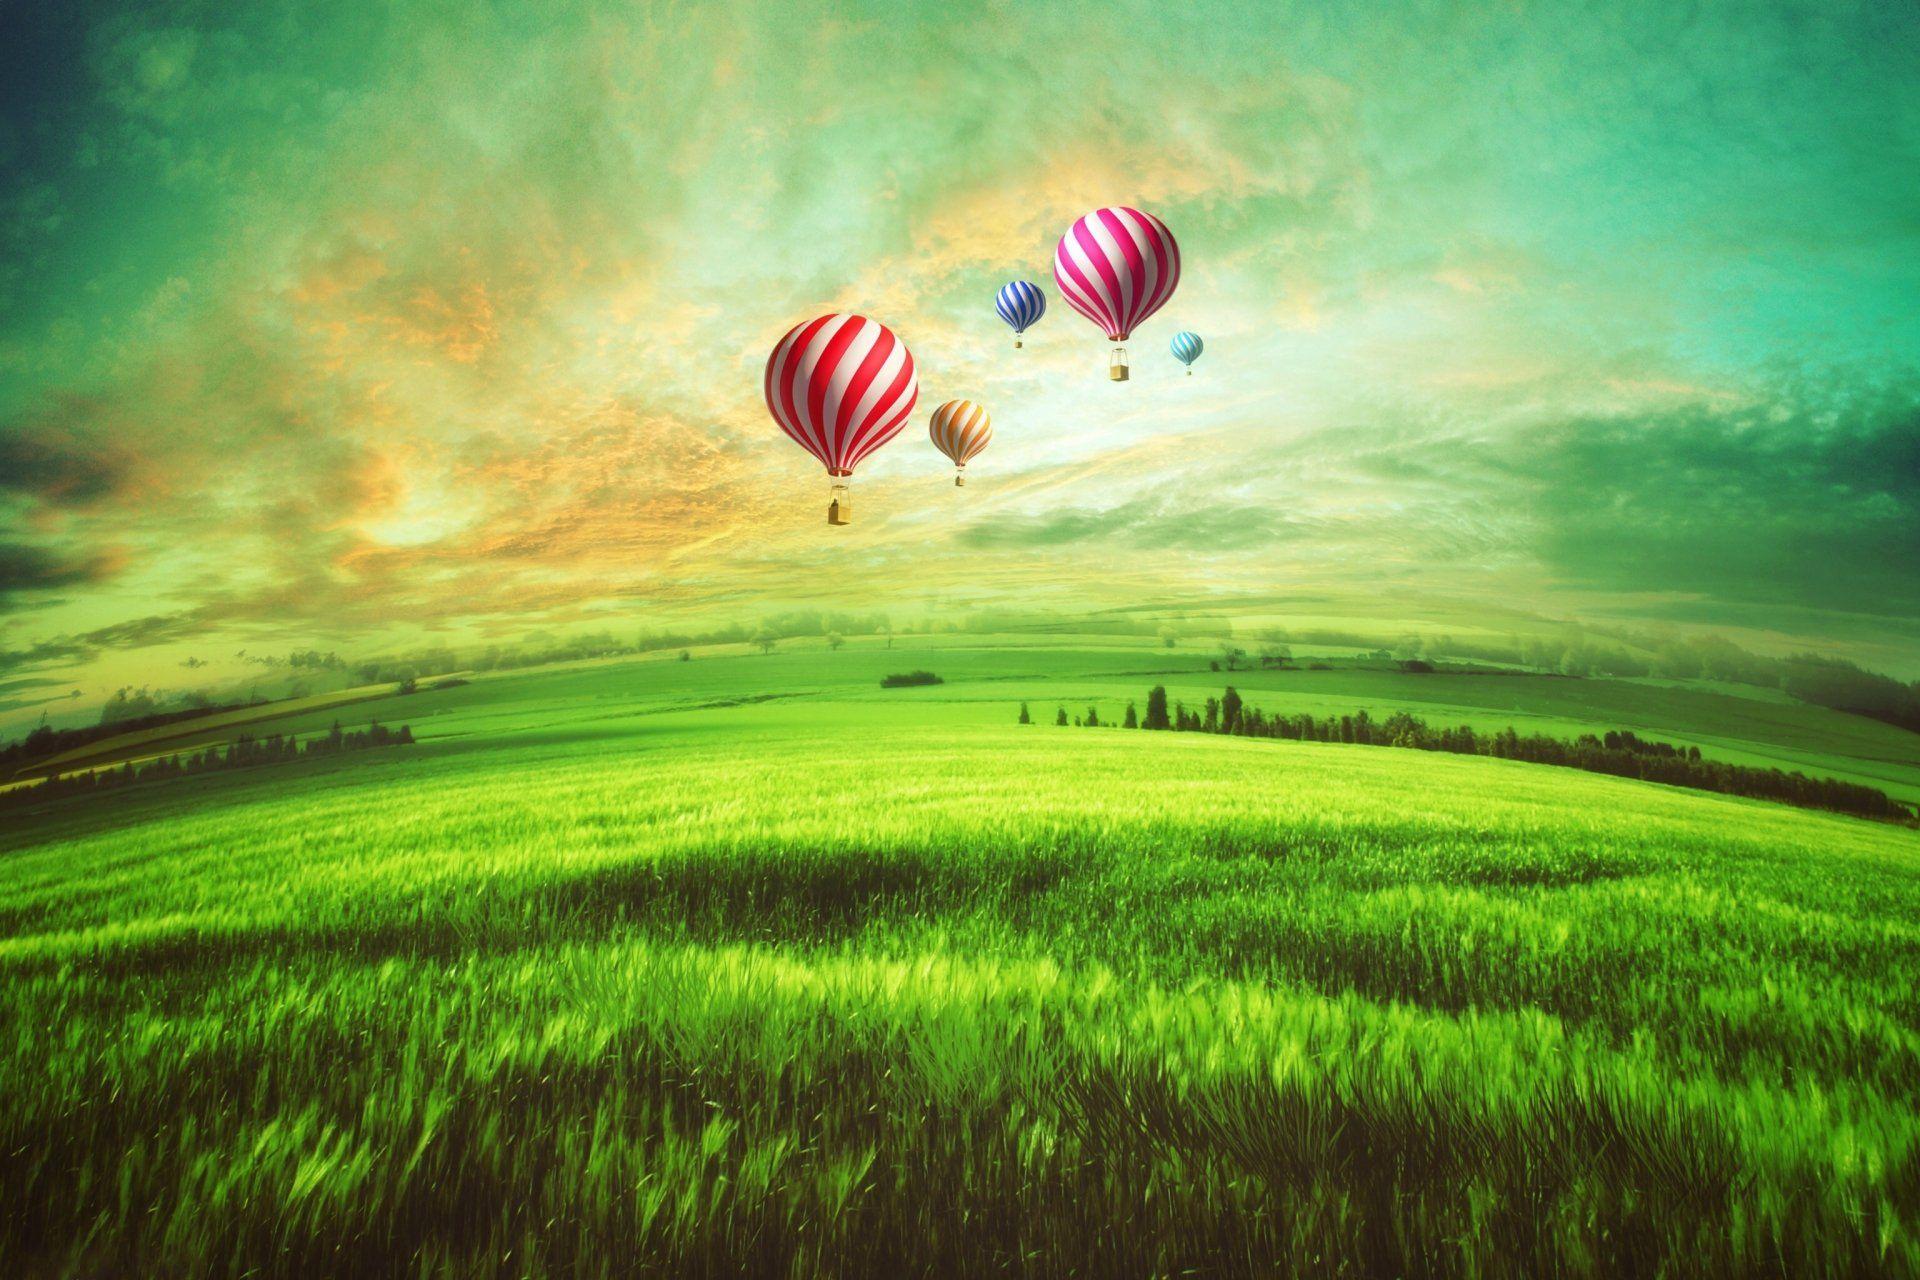 Vehicles Hot Air Balloon Artistic Field Landscape